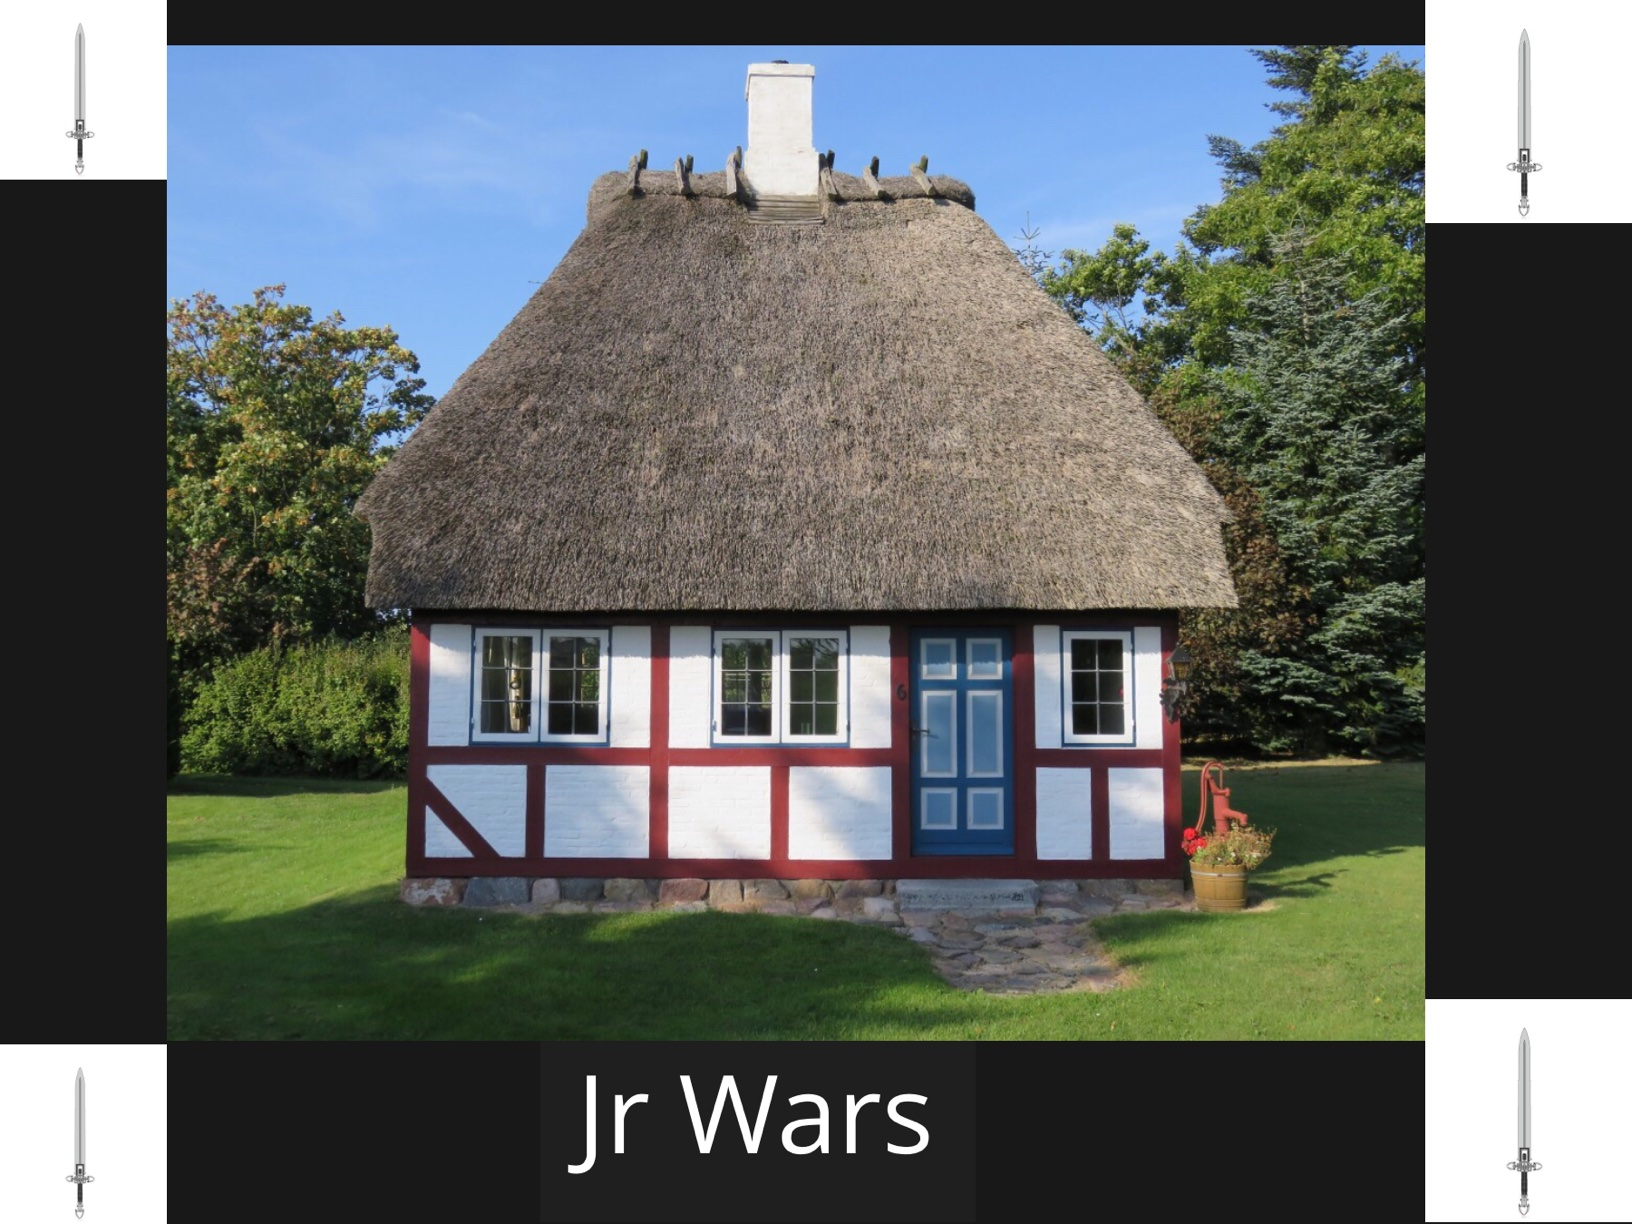 Jr Wars